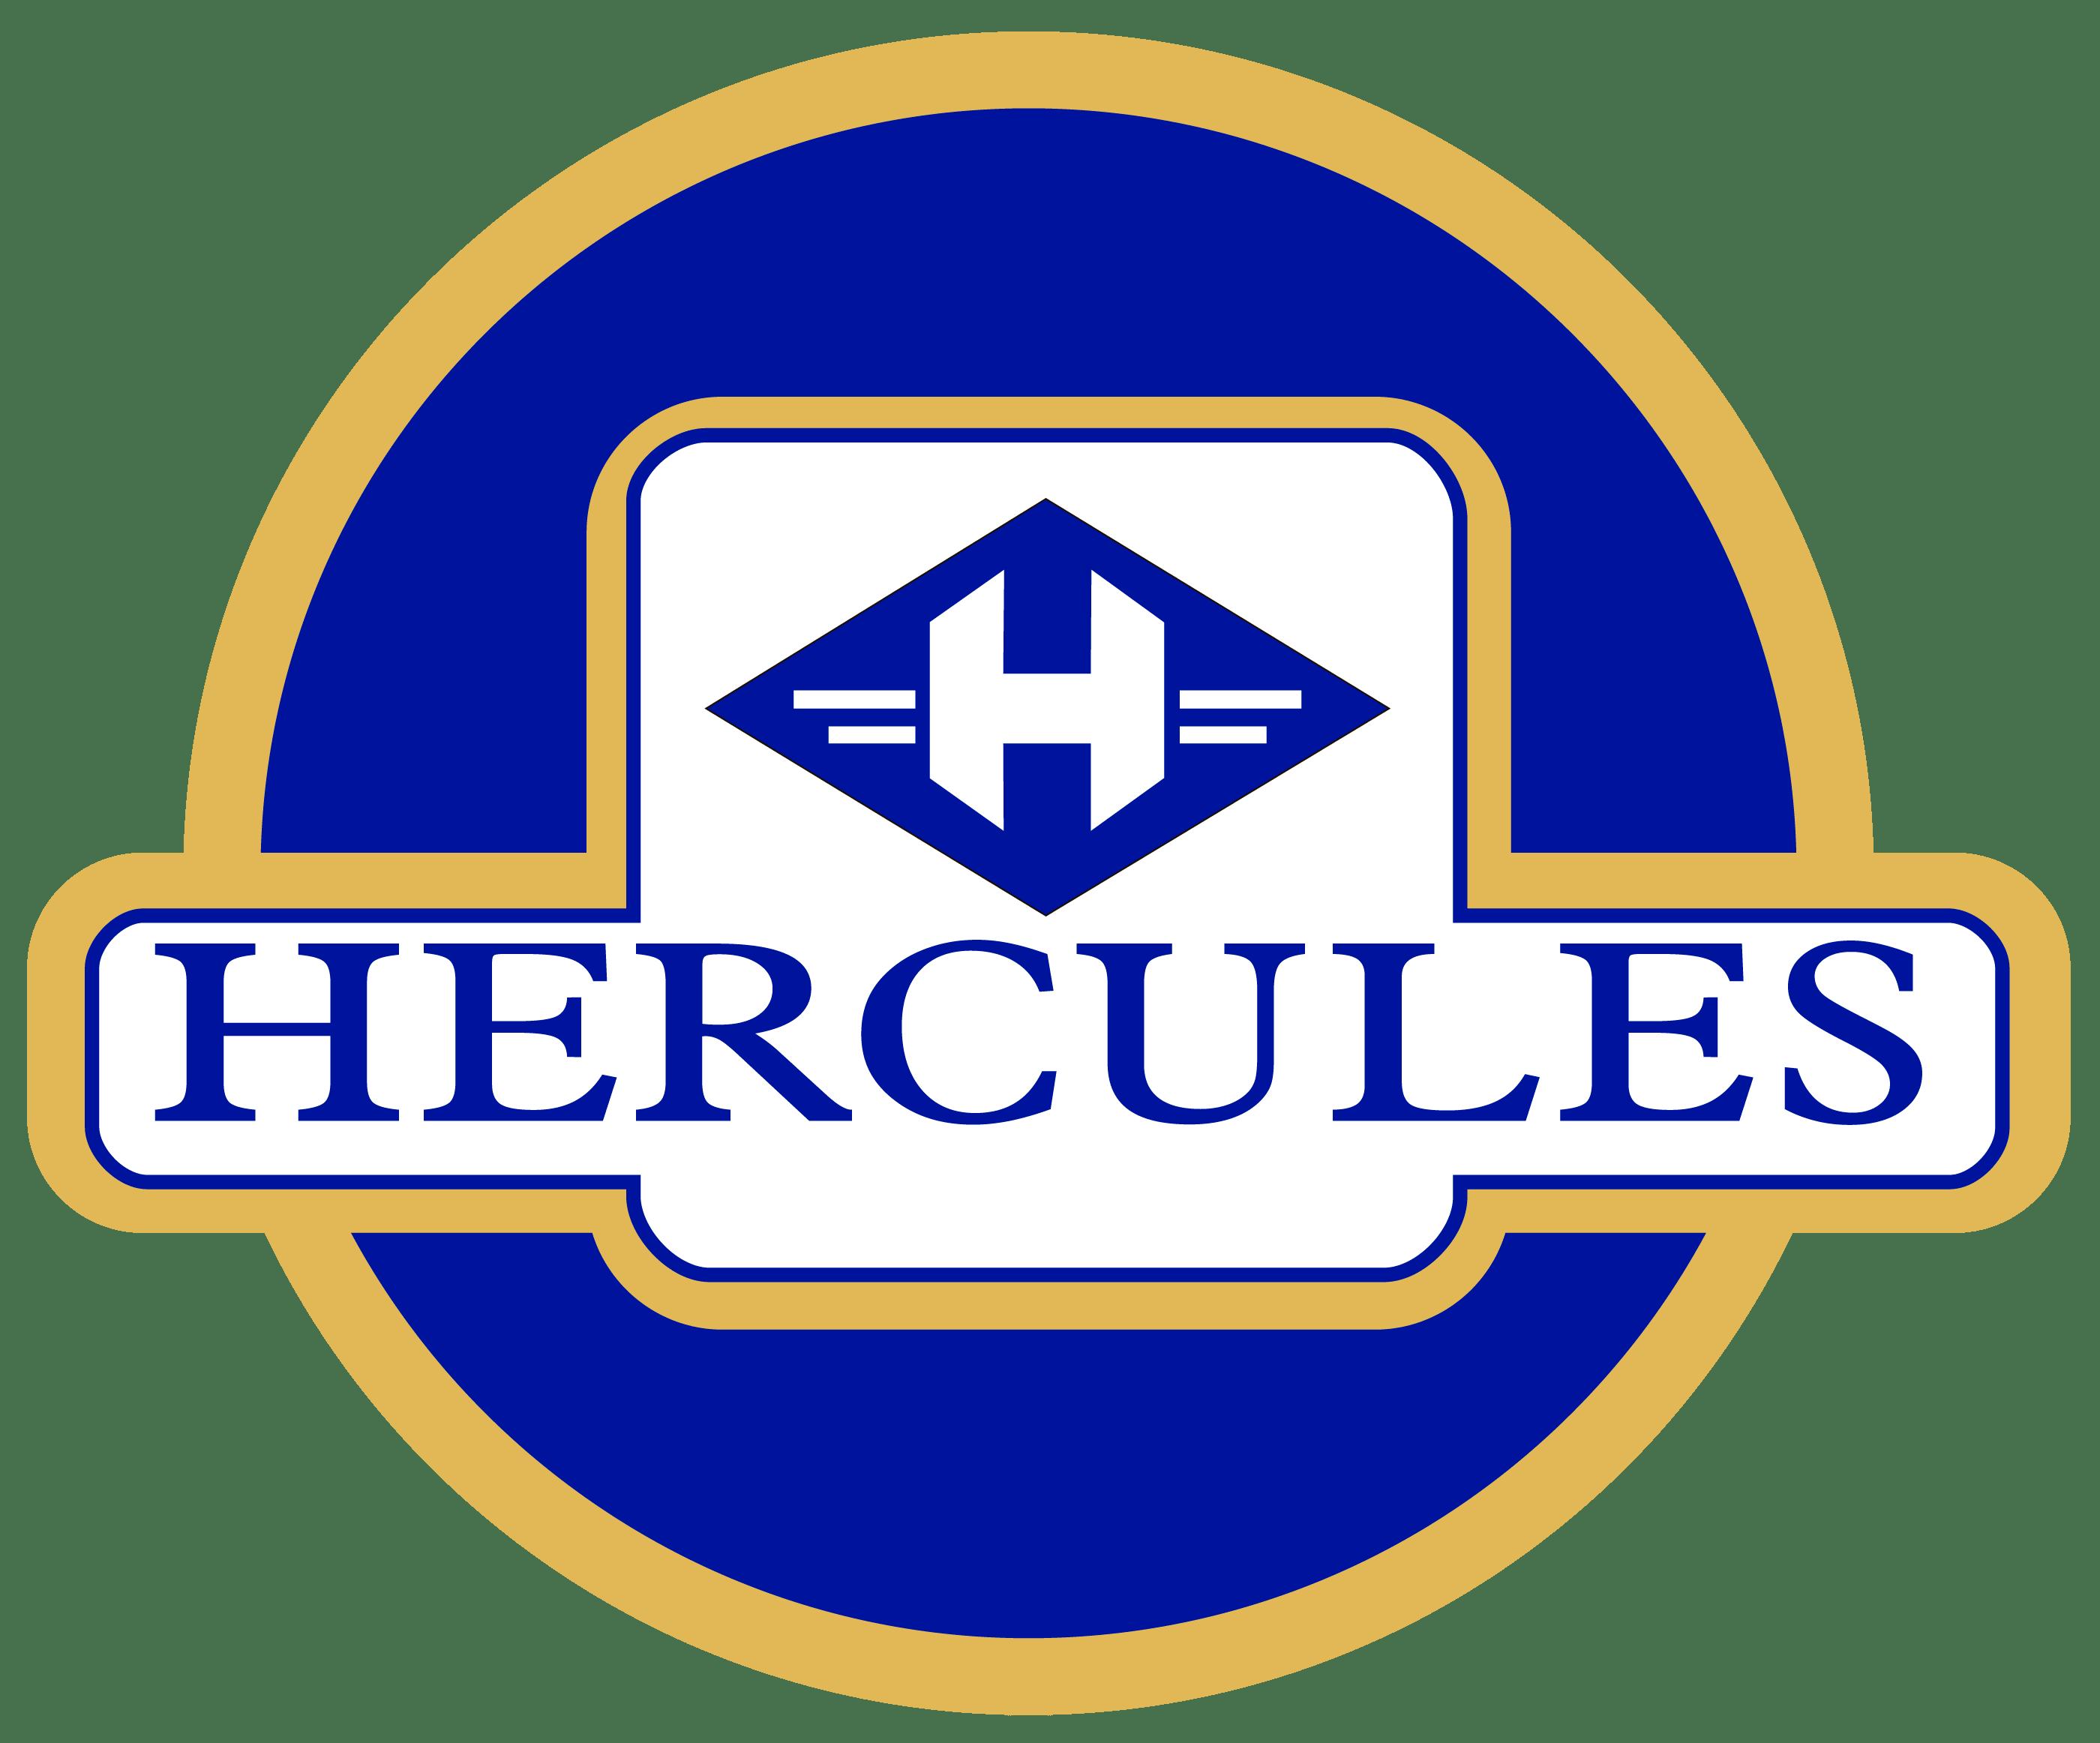 HERCULES PARTS